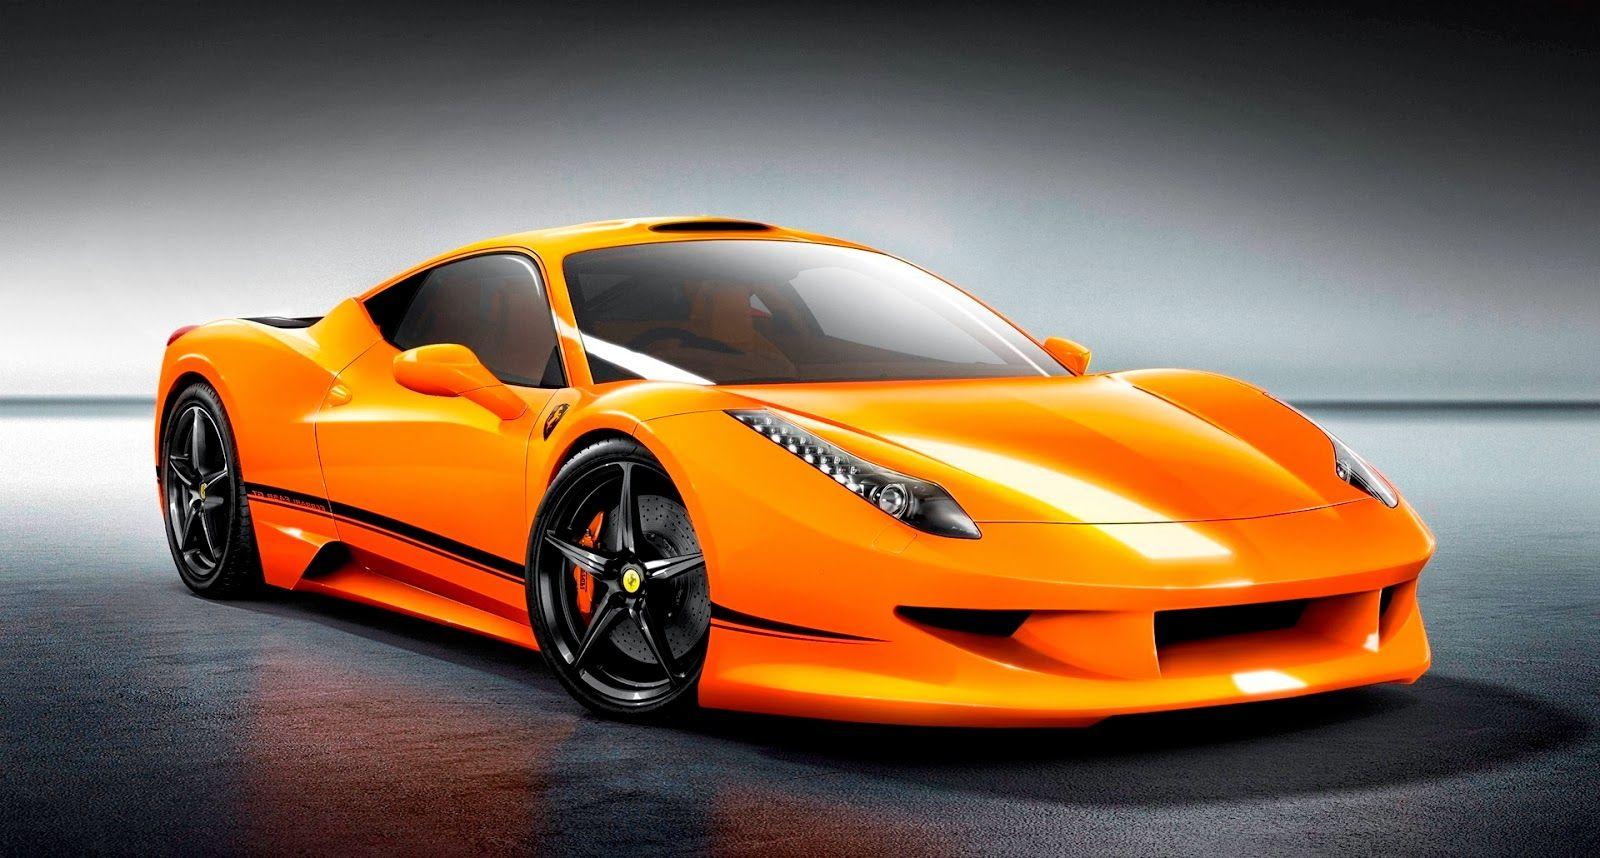 Ferrari Orange Color Wallpaper Jpg 1600 858 New Model Car Car Model New Car Photo